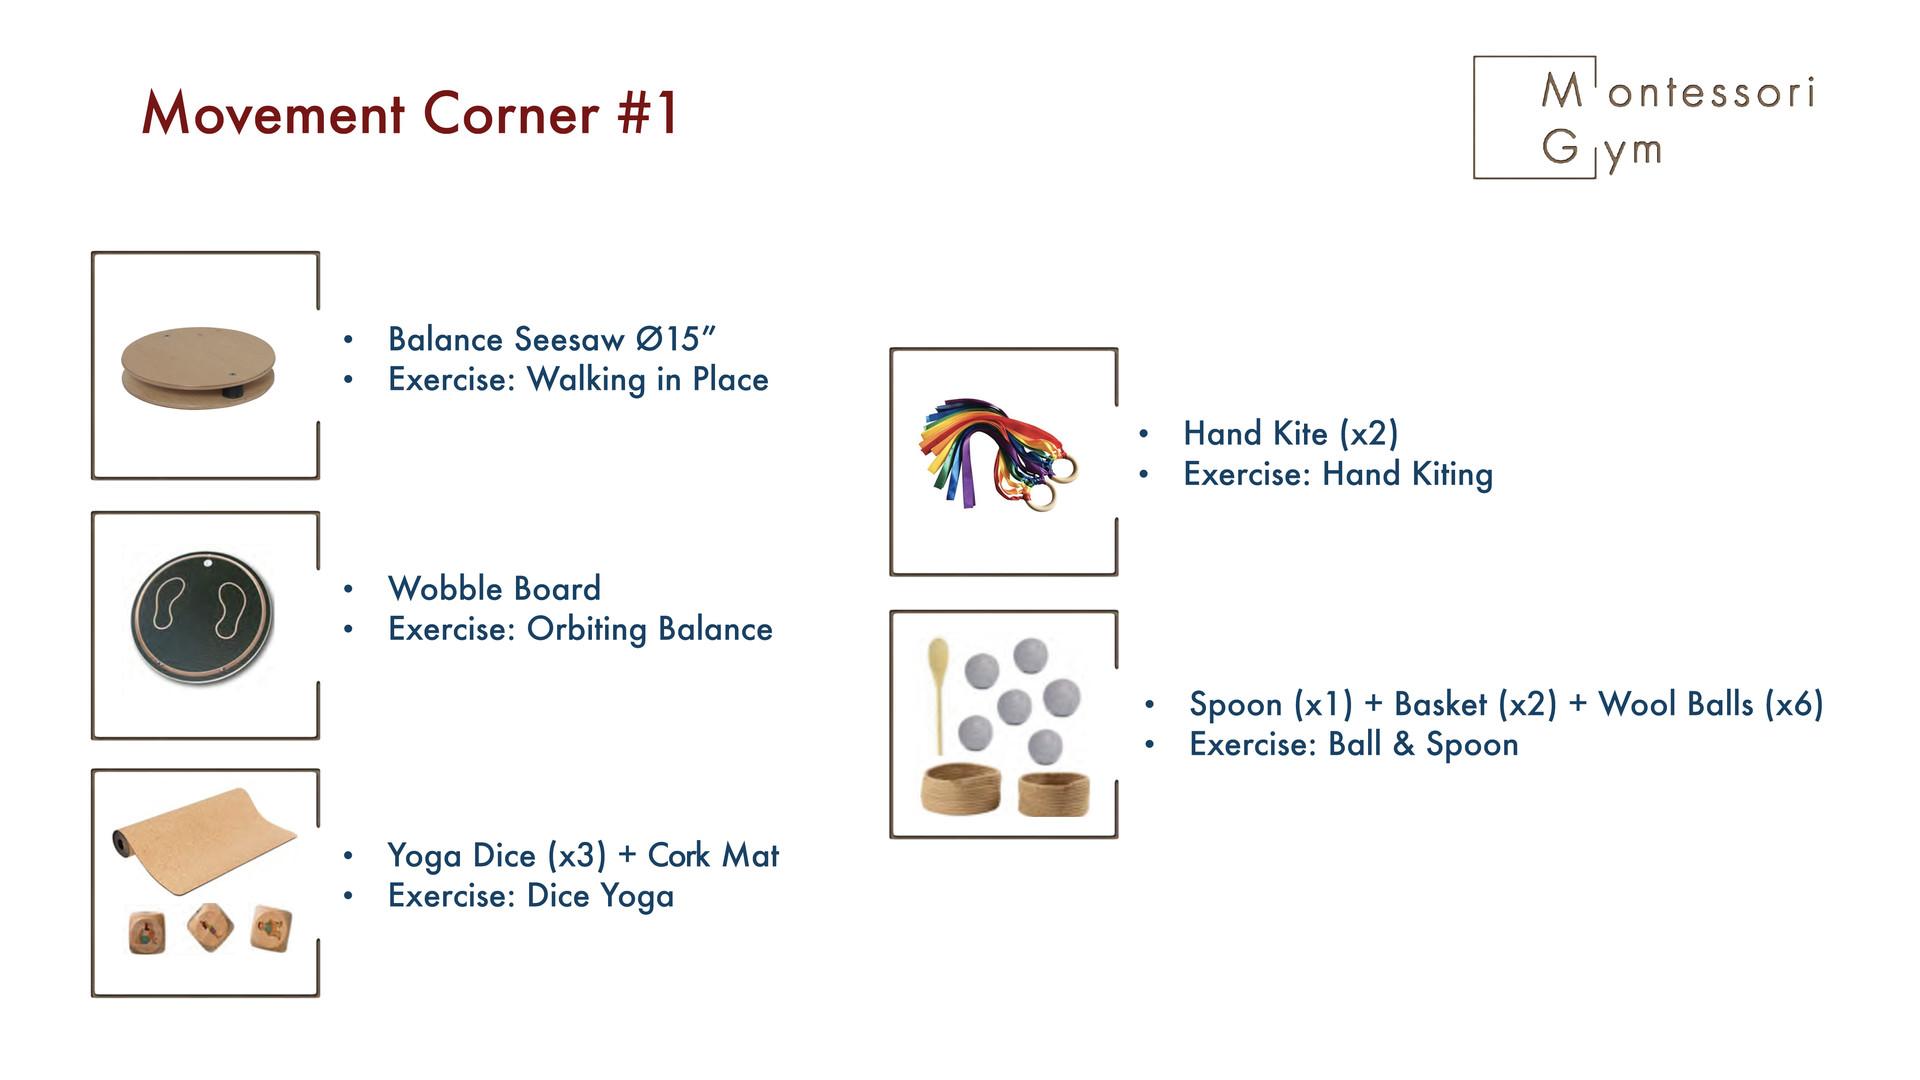 Movement Corner #1